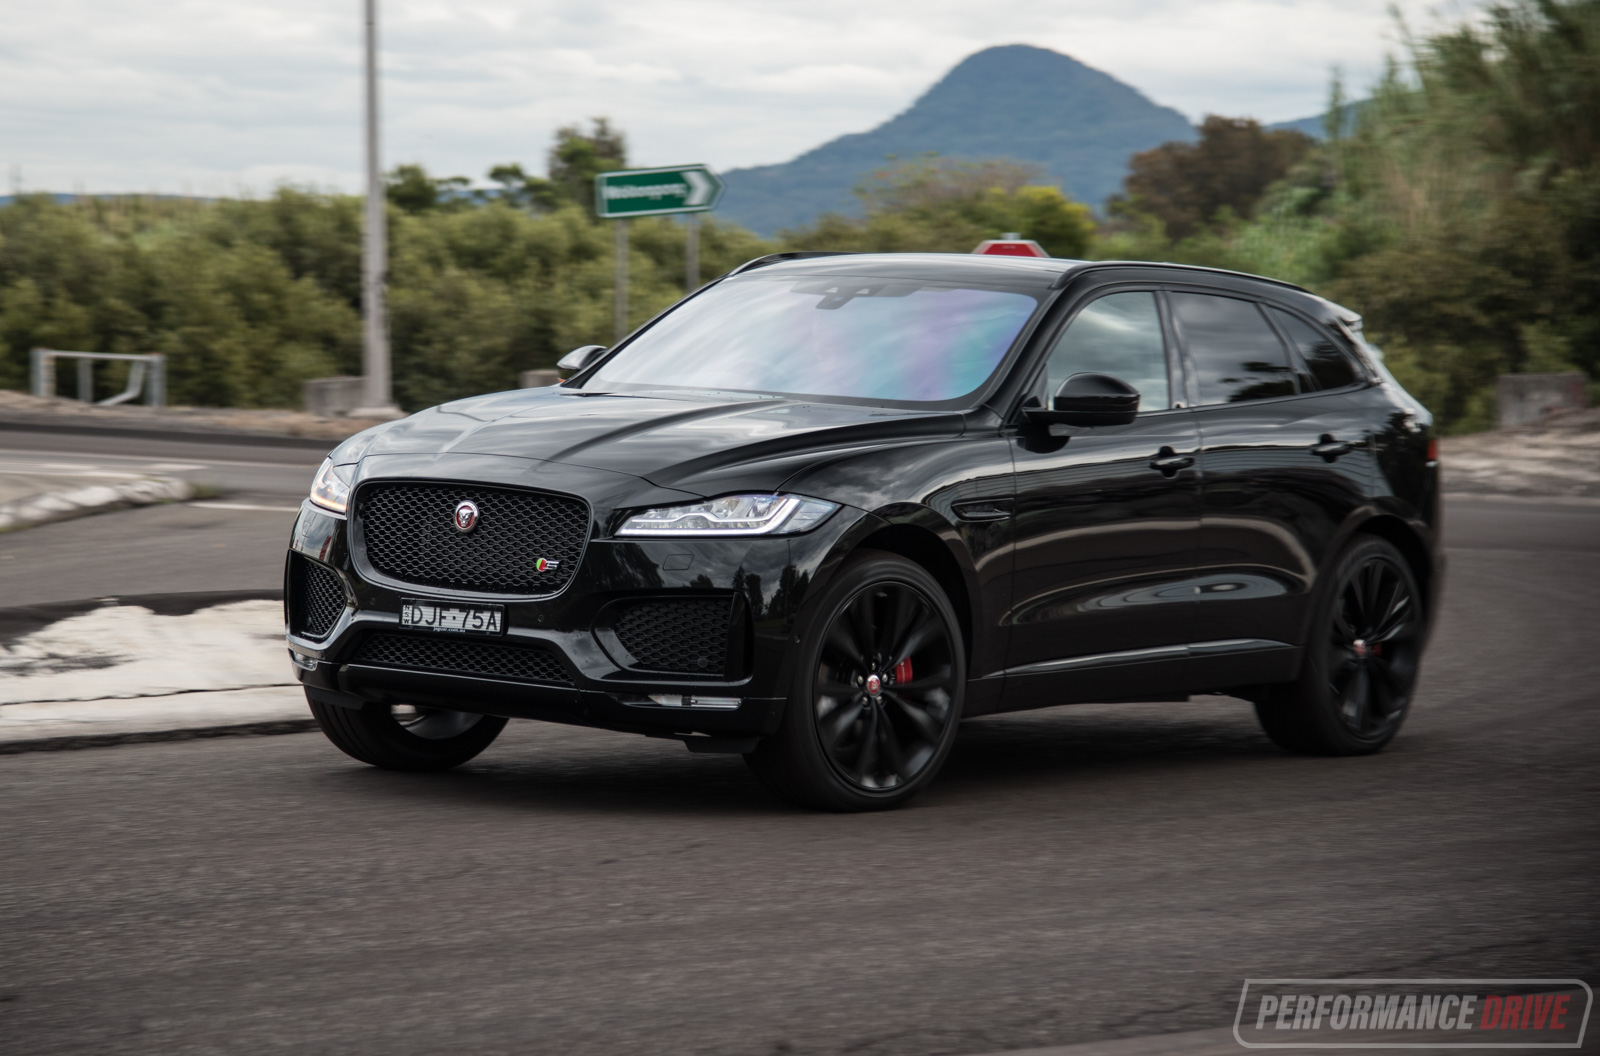 2016 Jaguar F Pace S 35t Review Video Performancedrive